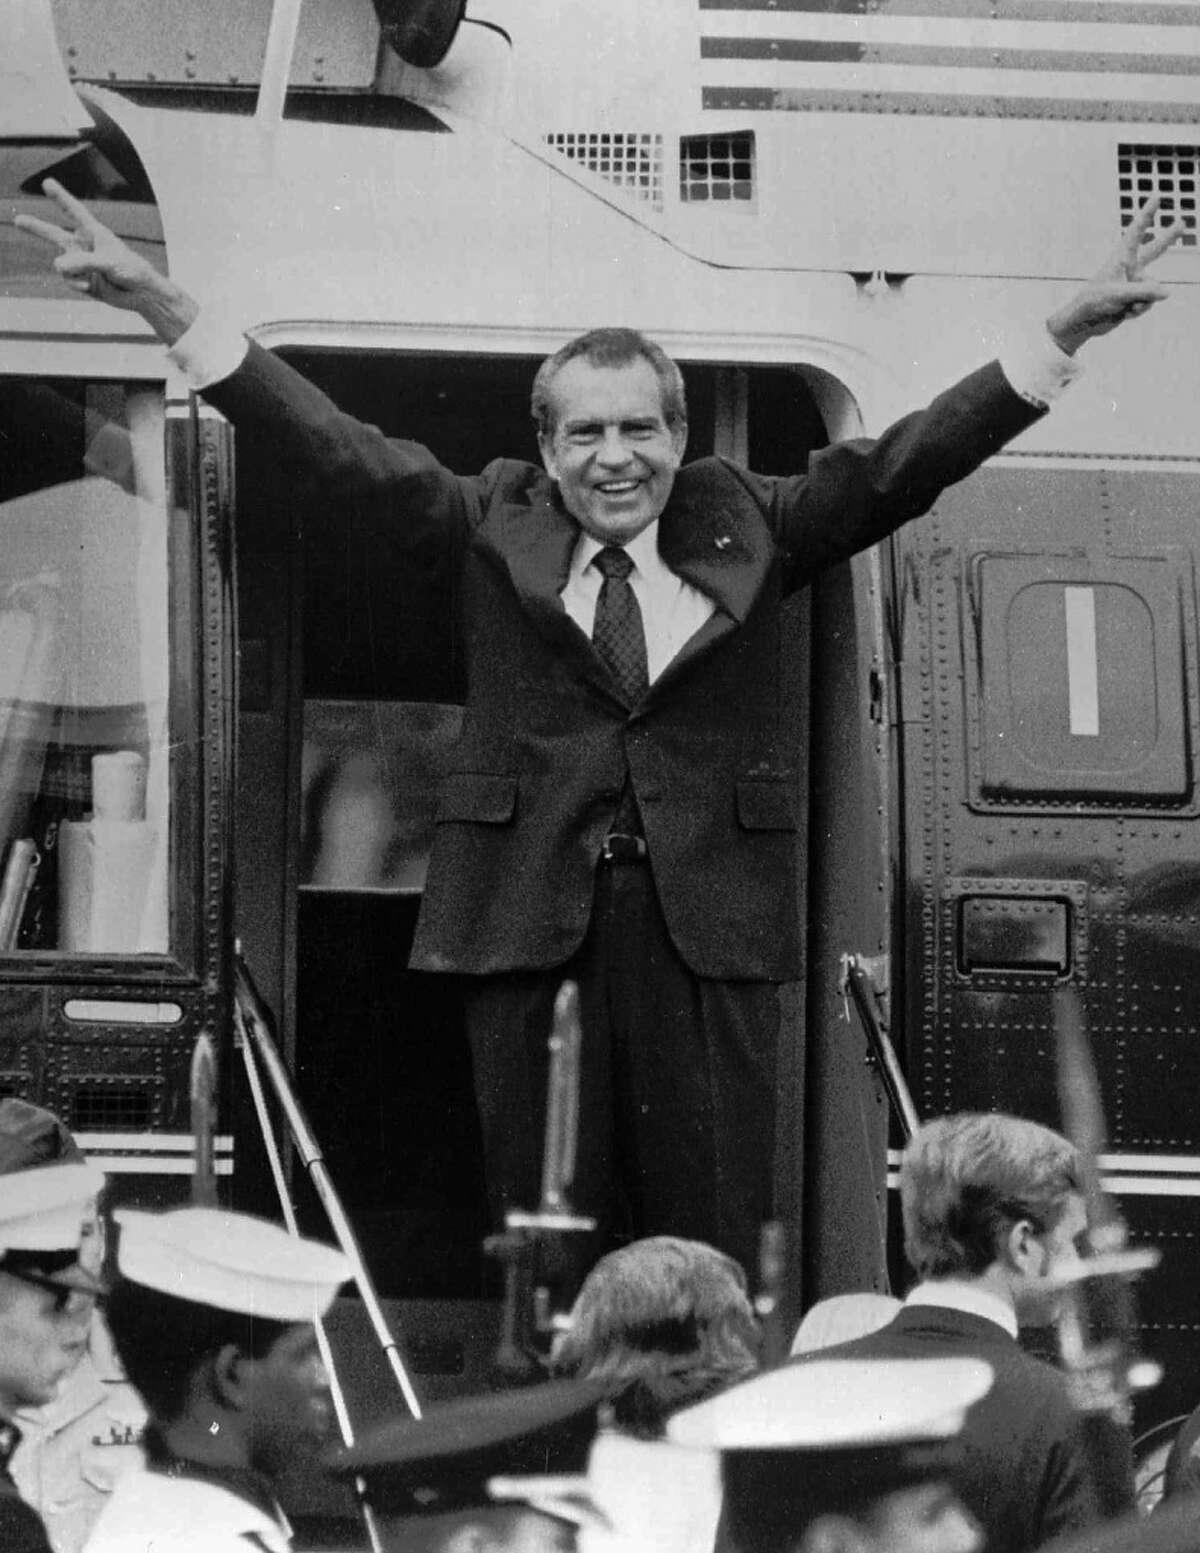 Nixon's last gesture after resigning the presidency.